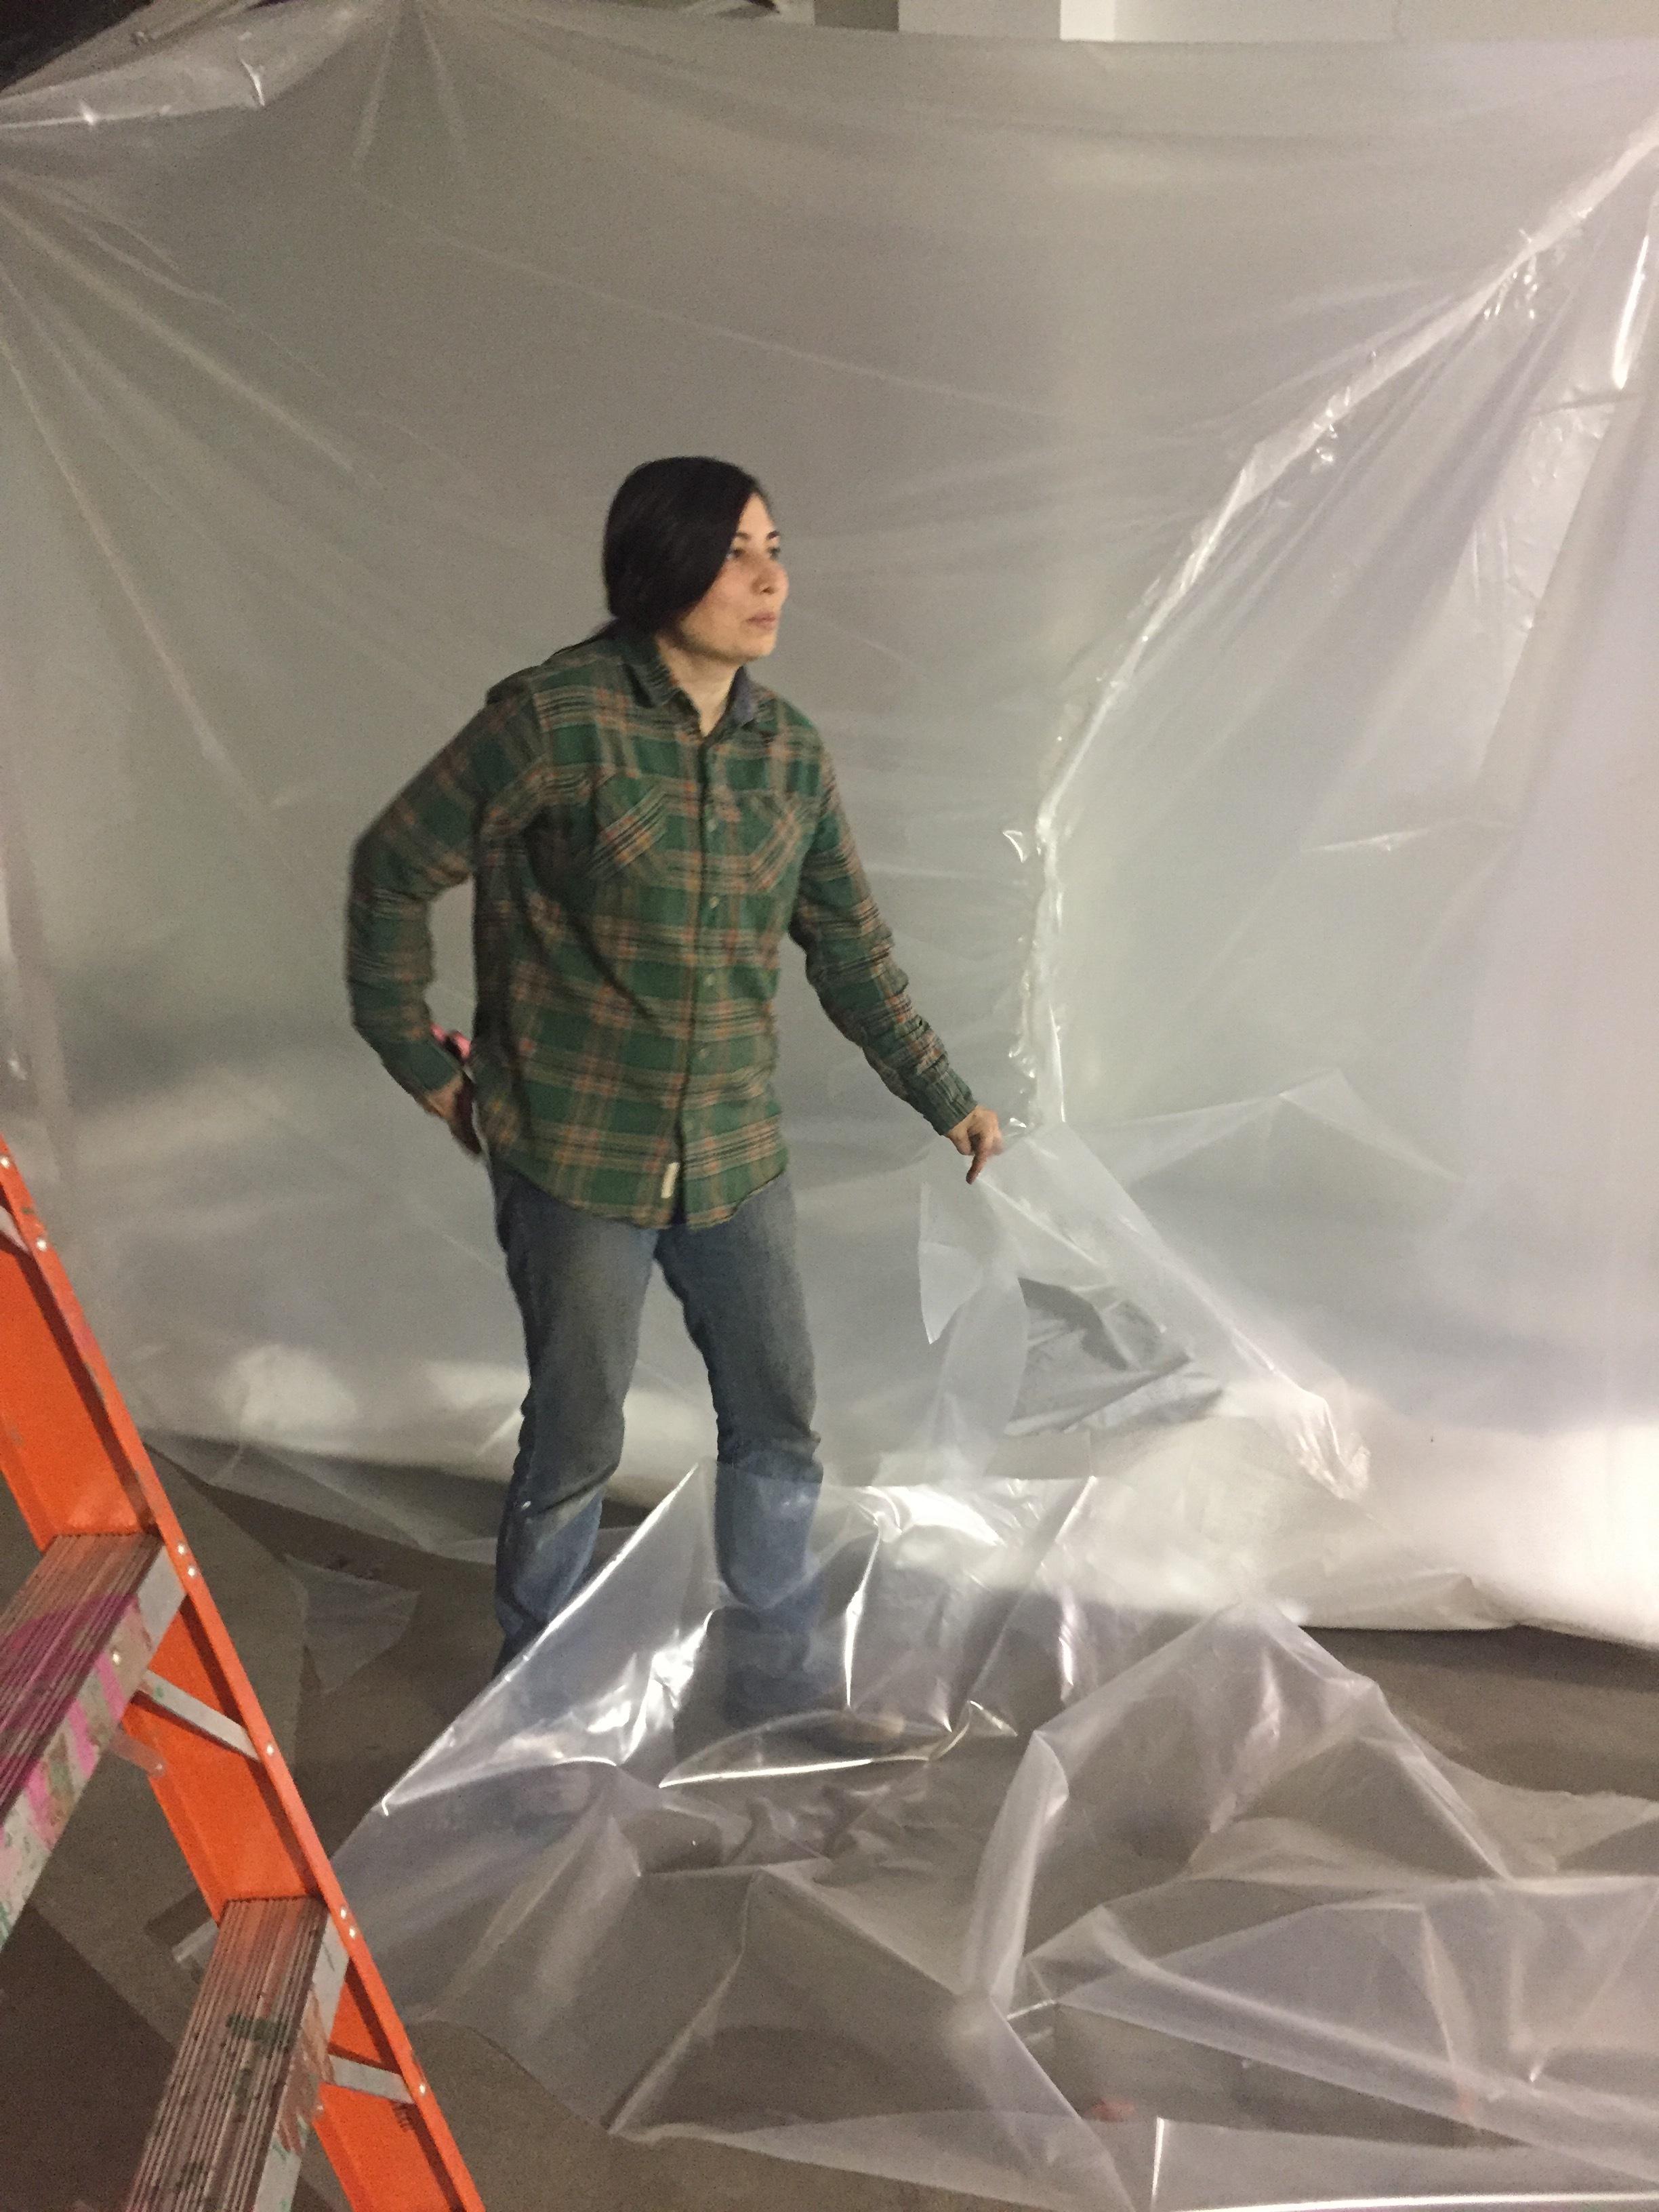 Asia Ward installs Cocoon